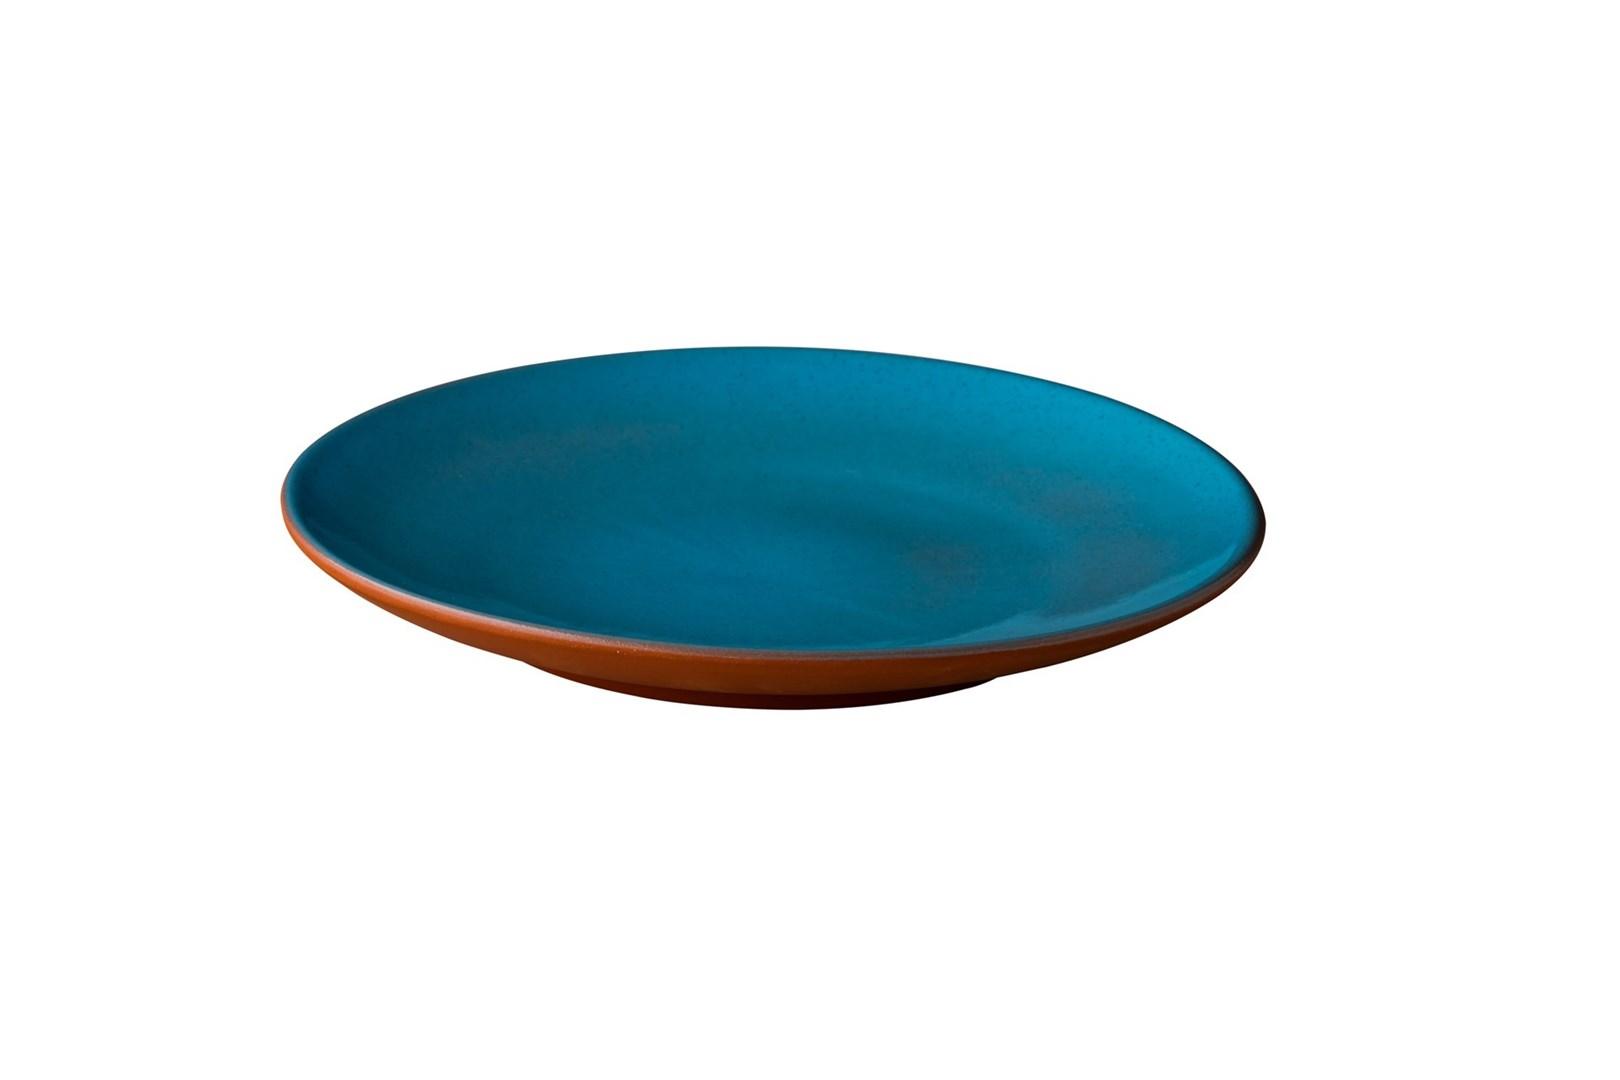 Productafbeelding Stoneheart bord 20 x 2 cm blauw